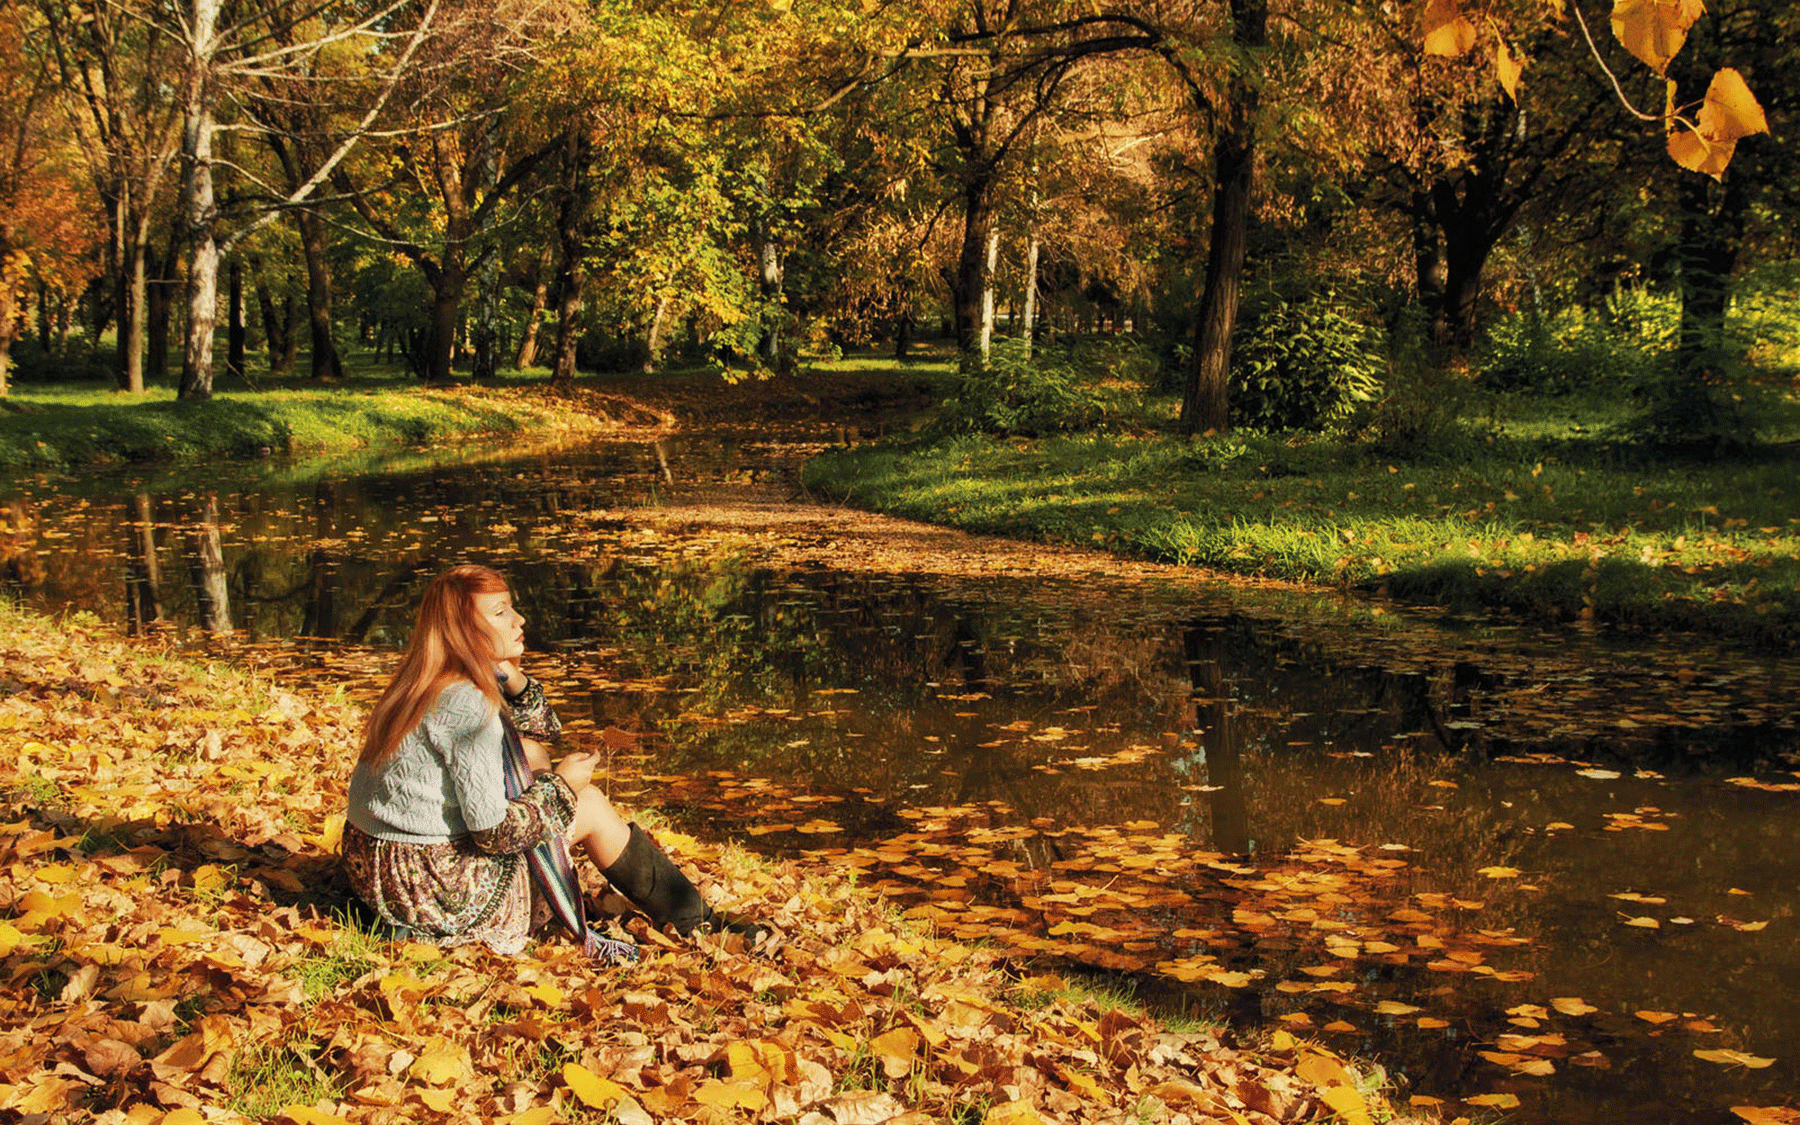 Herbstwald mit Frau an Fluss im Herbsturlaub Tirol